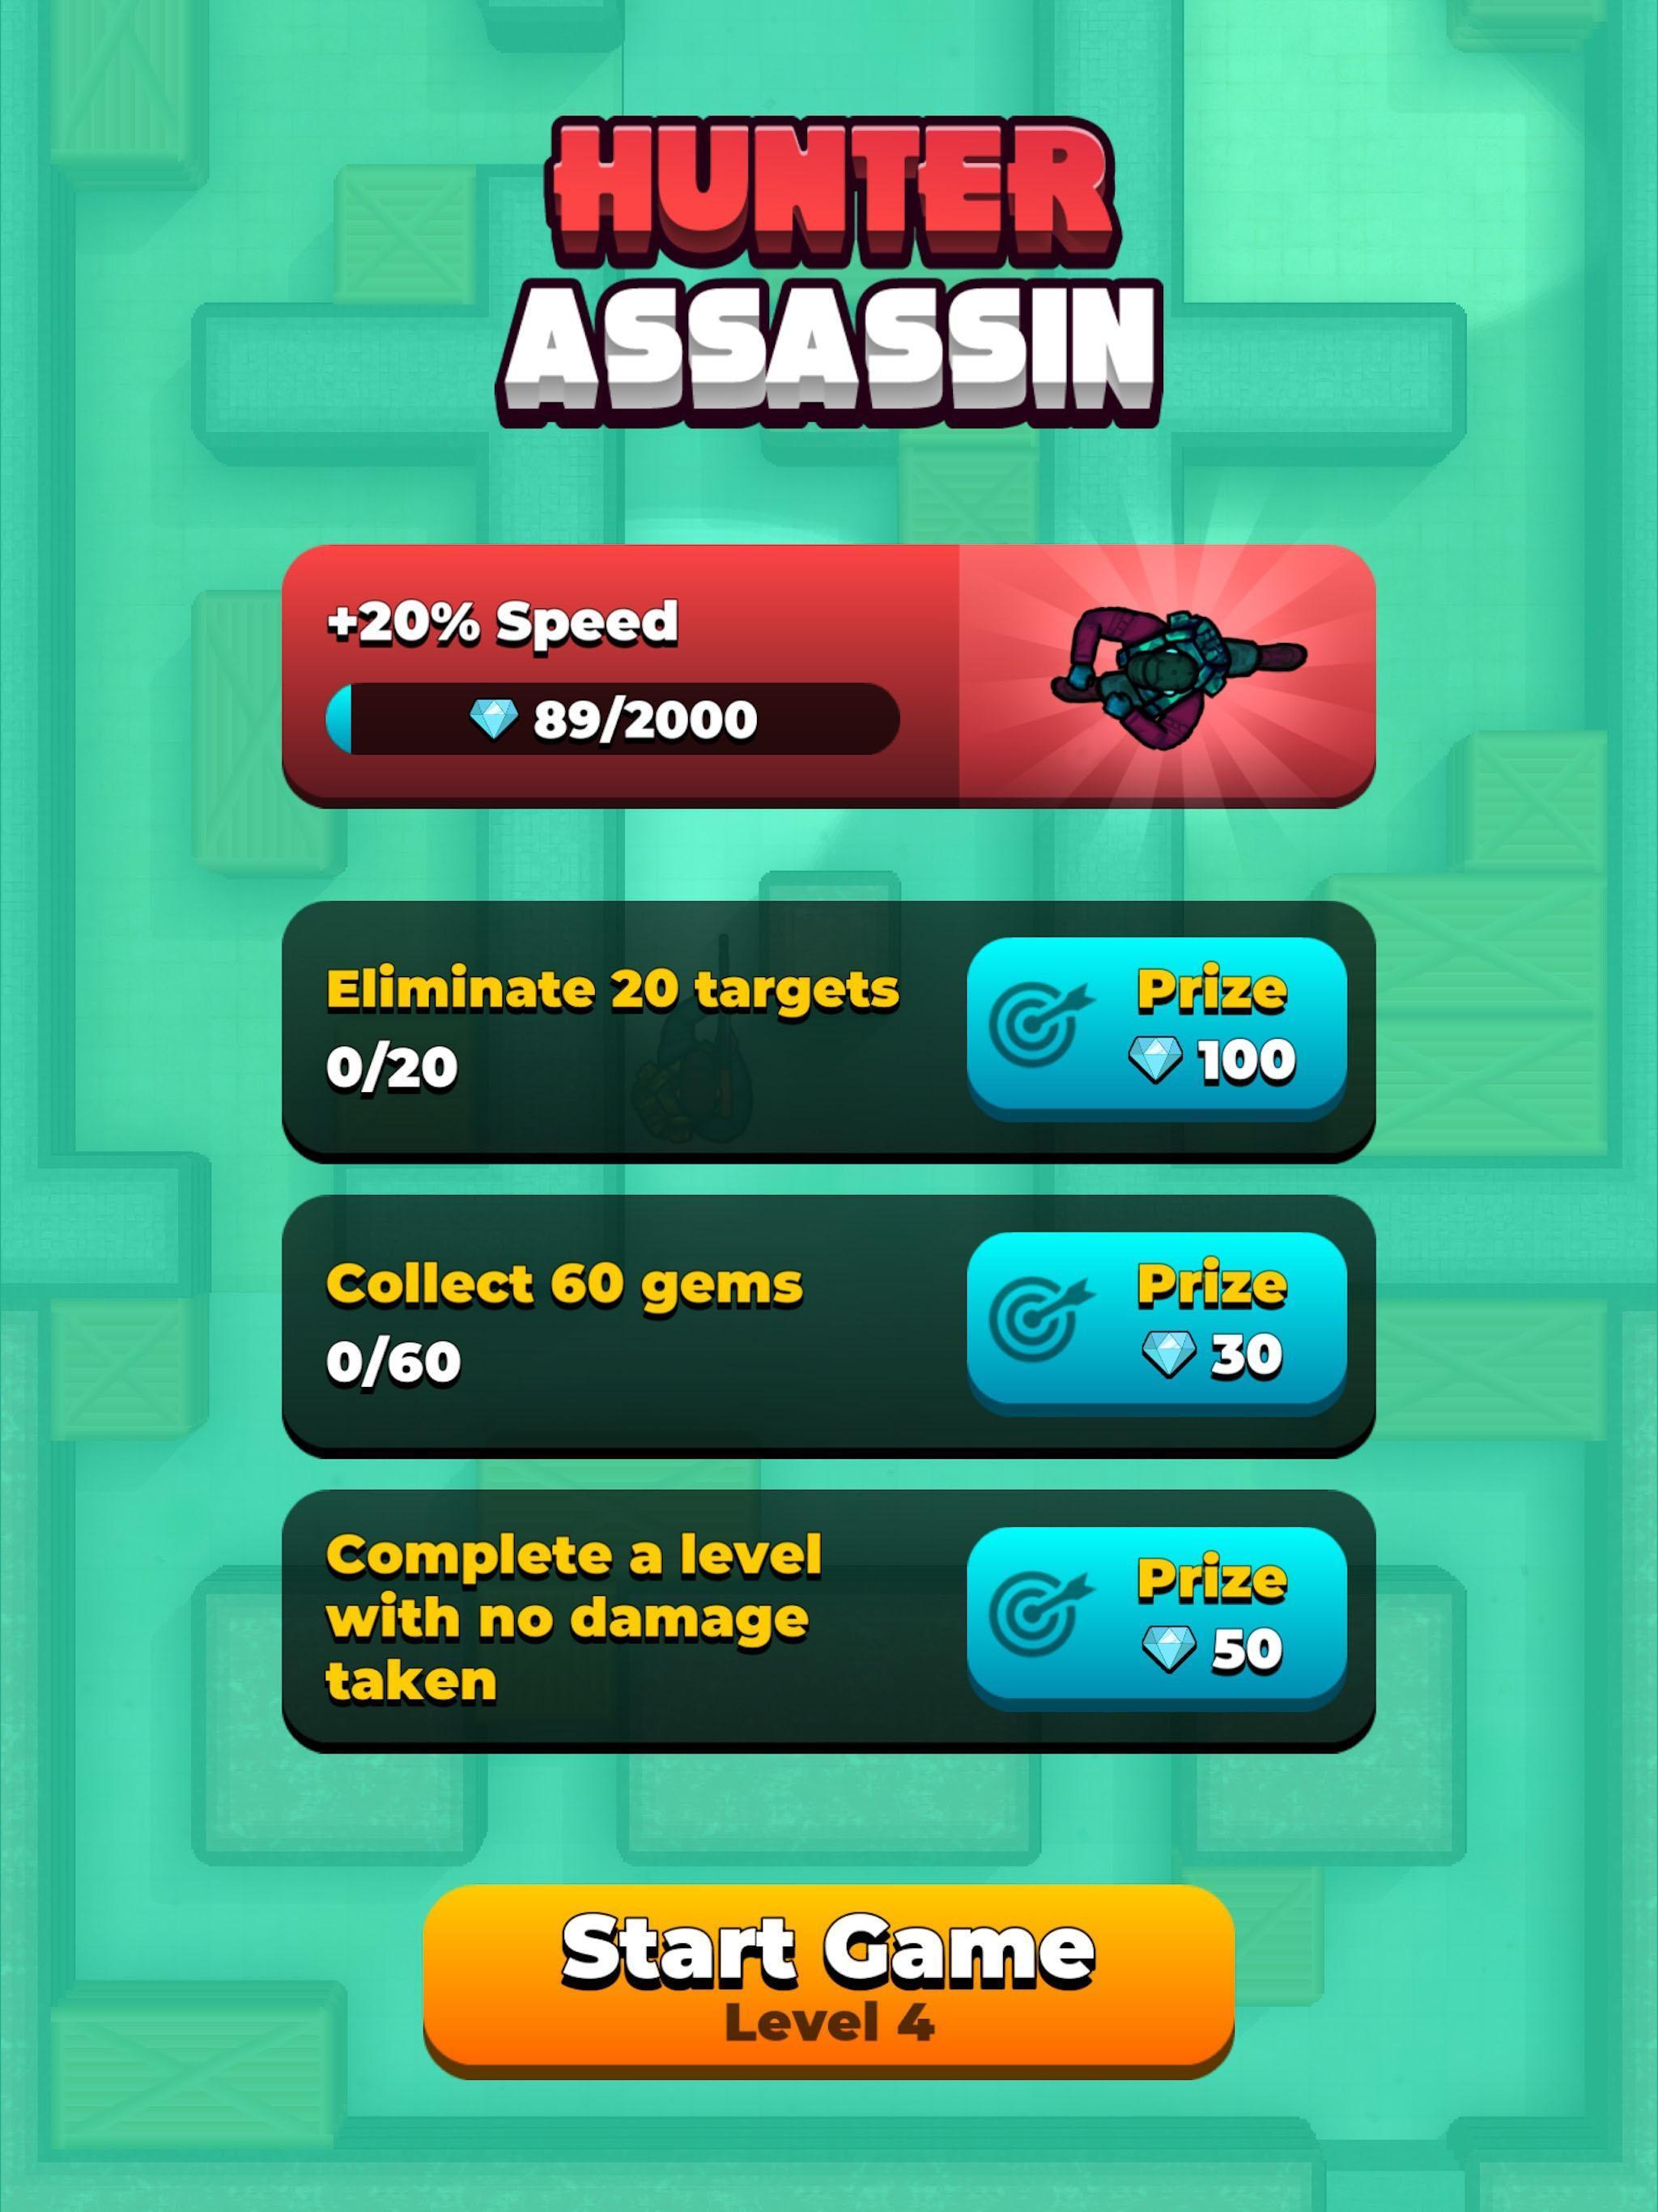 Roblox Ninja Assassin Glitch Auto Clicking Hunter Assassin For Android Apk Download